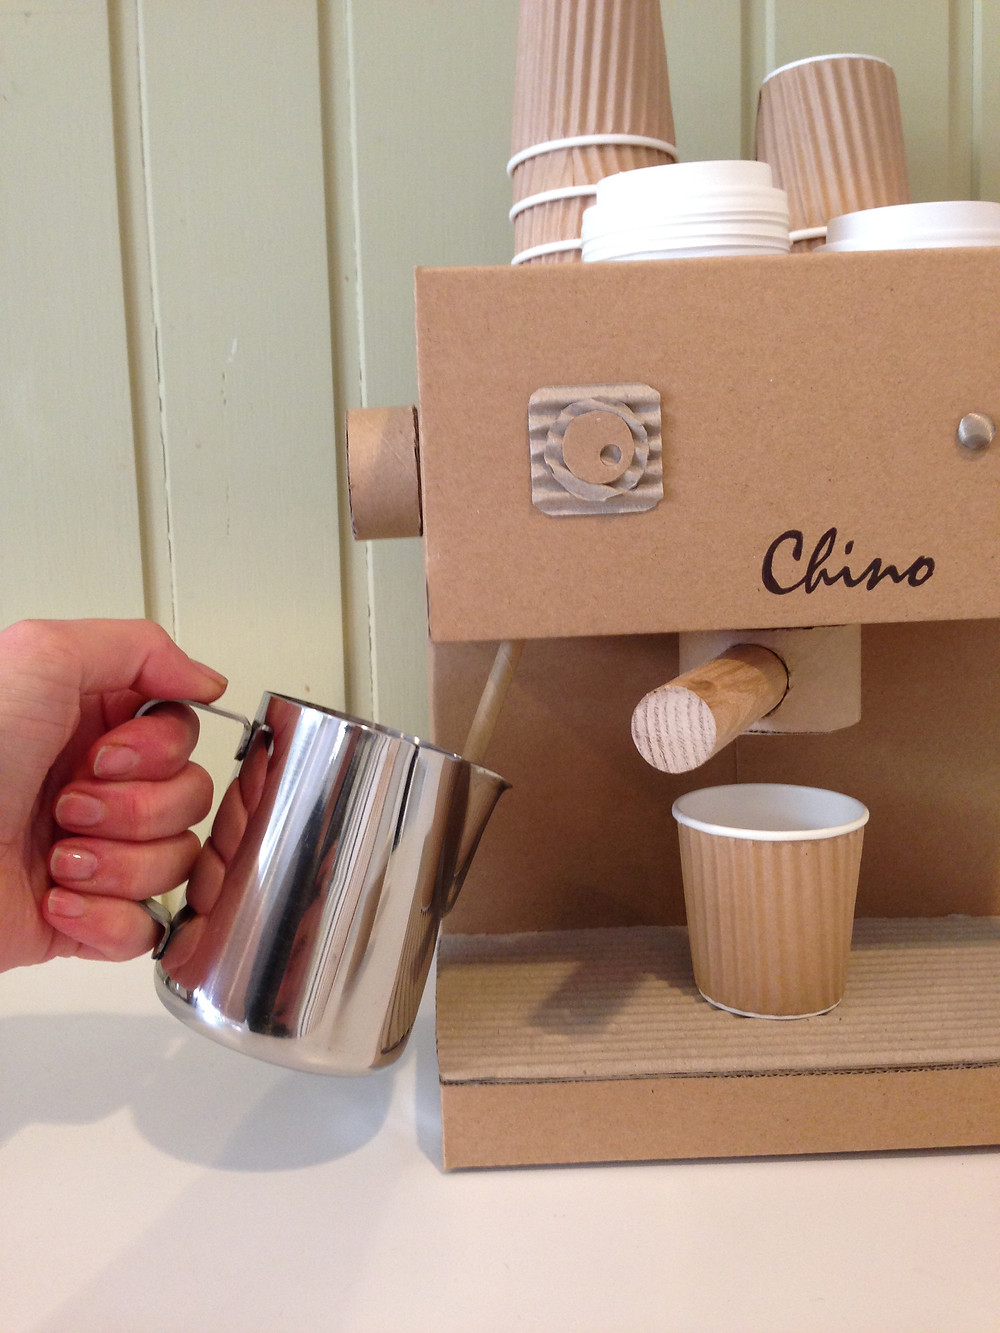 Cardboard Cappuccino Machine Toy